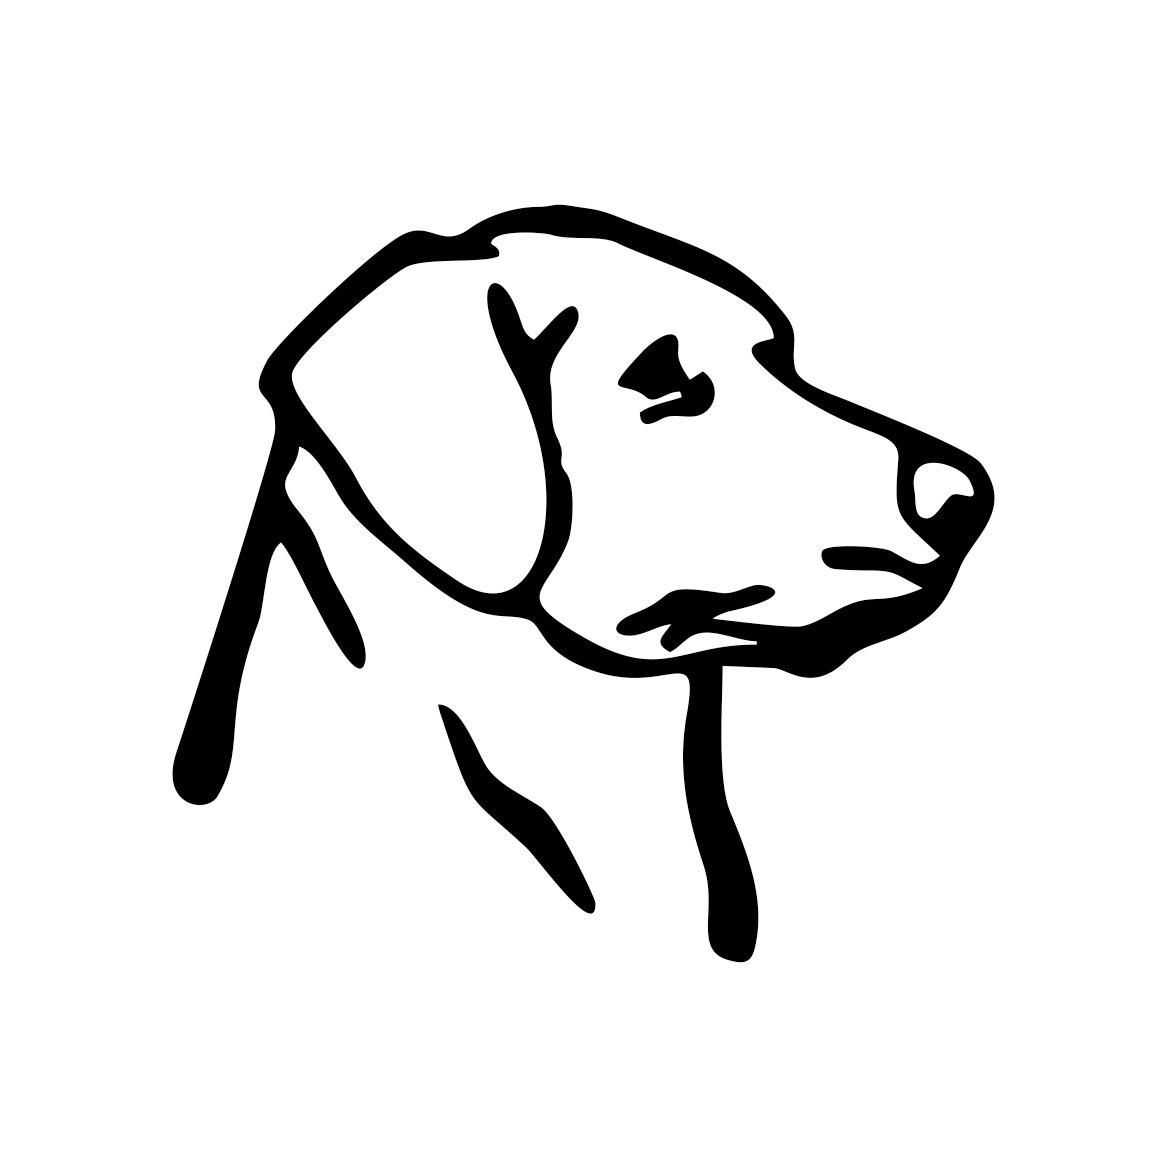 Labrador Retriever Dog Graphics Design Svg By Vectordesign